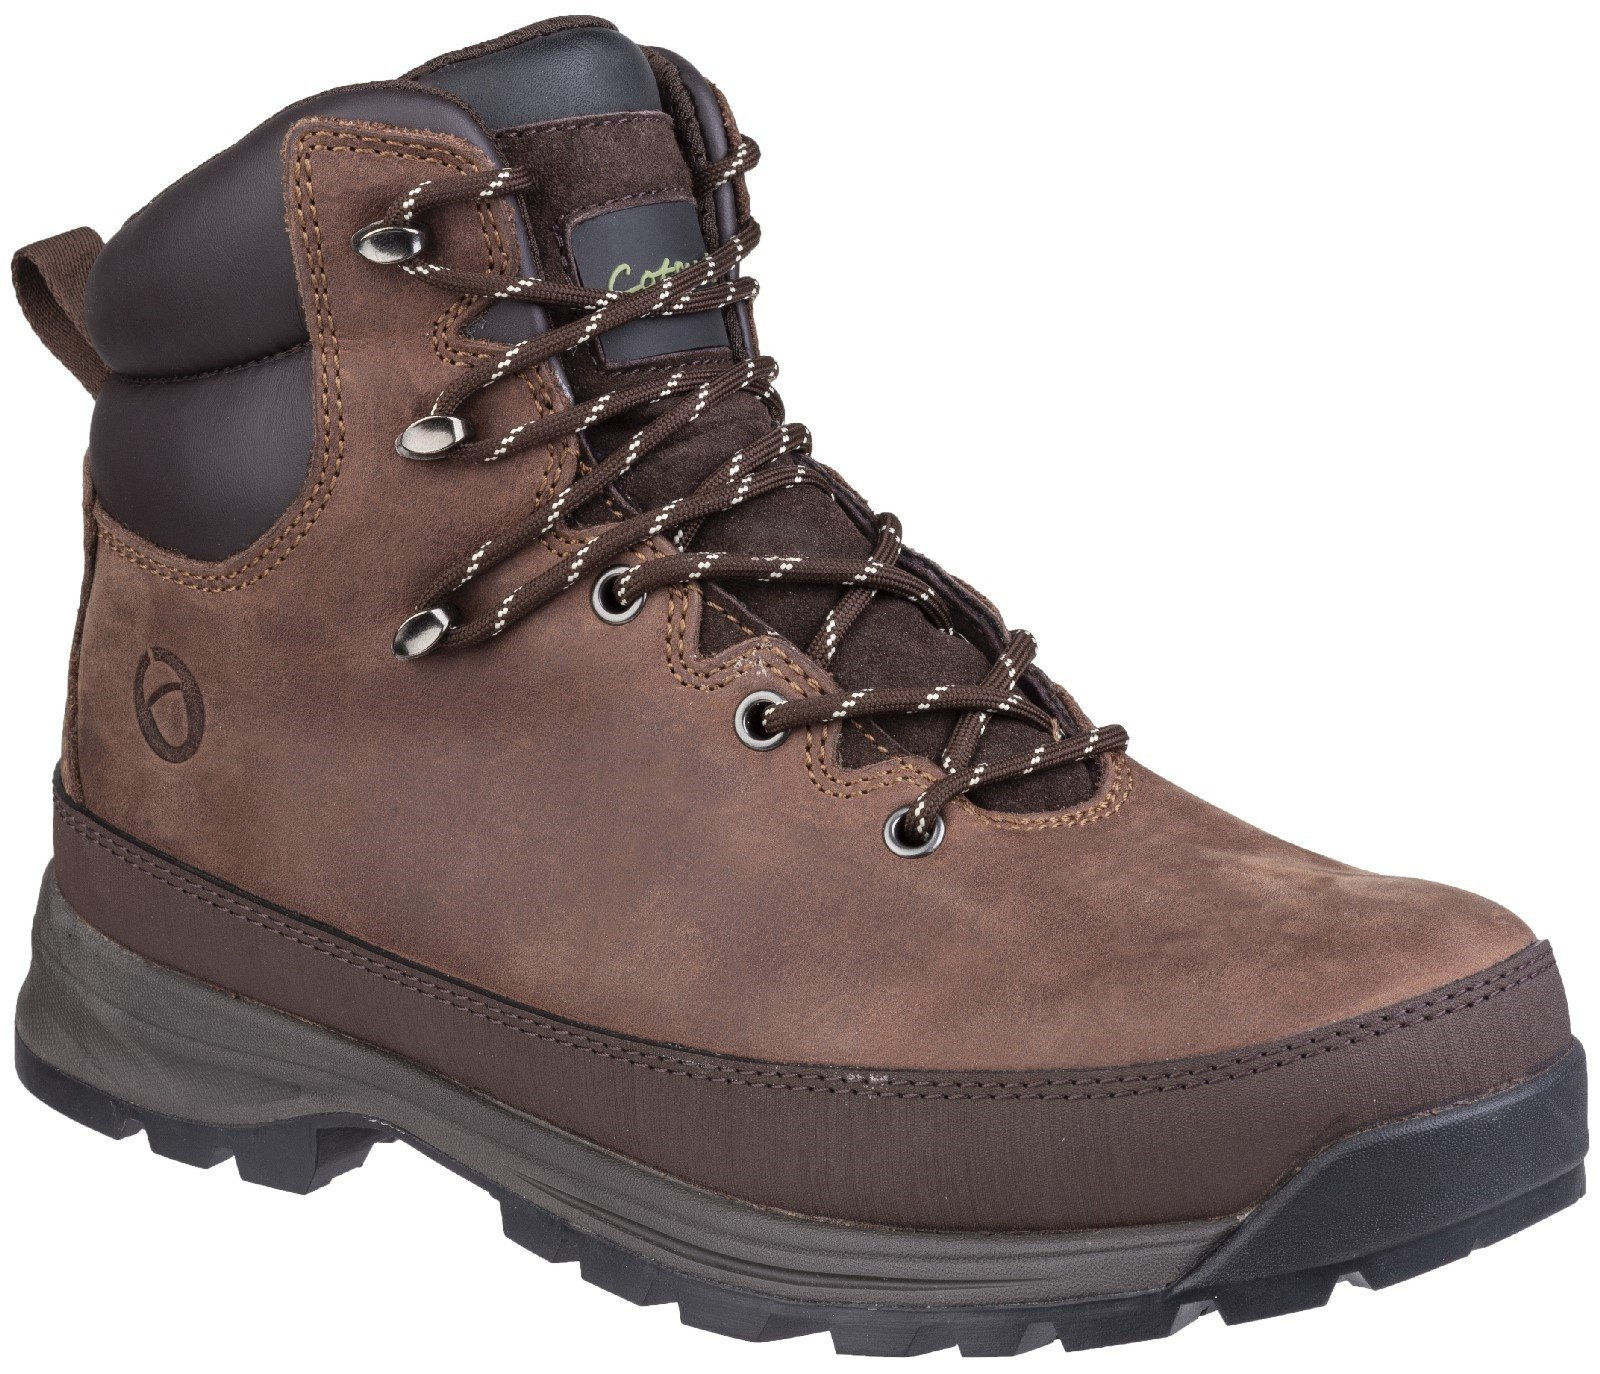 Cotswold Men's Sudgrove Lace Up Boot Brown 27137 - Brown 7